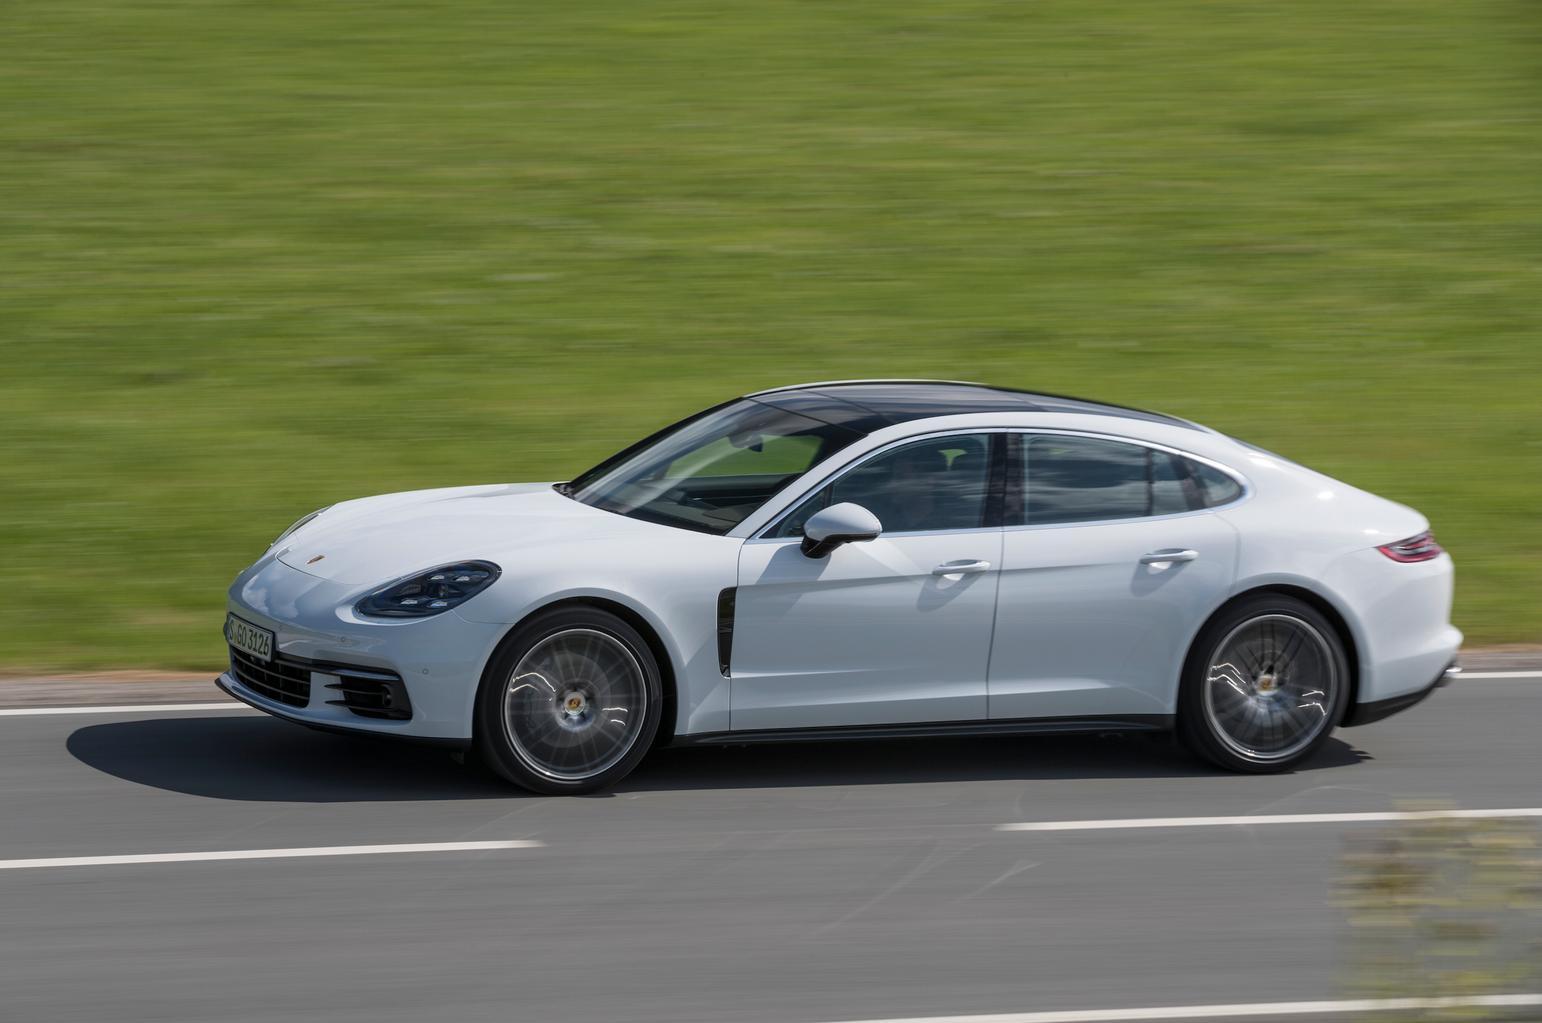 2016 Porsche Panamera 4S Diesel review